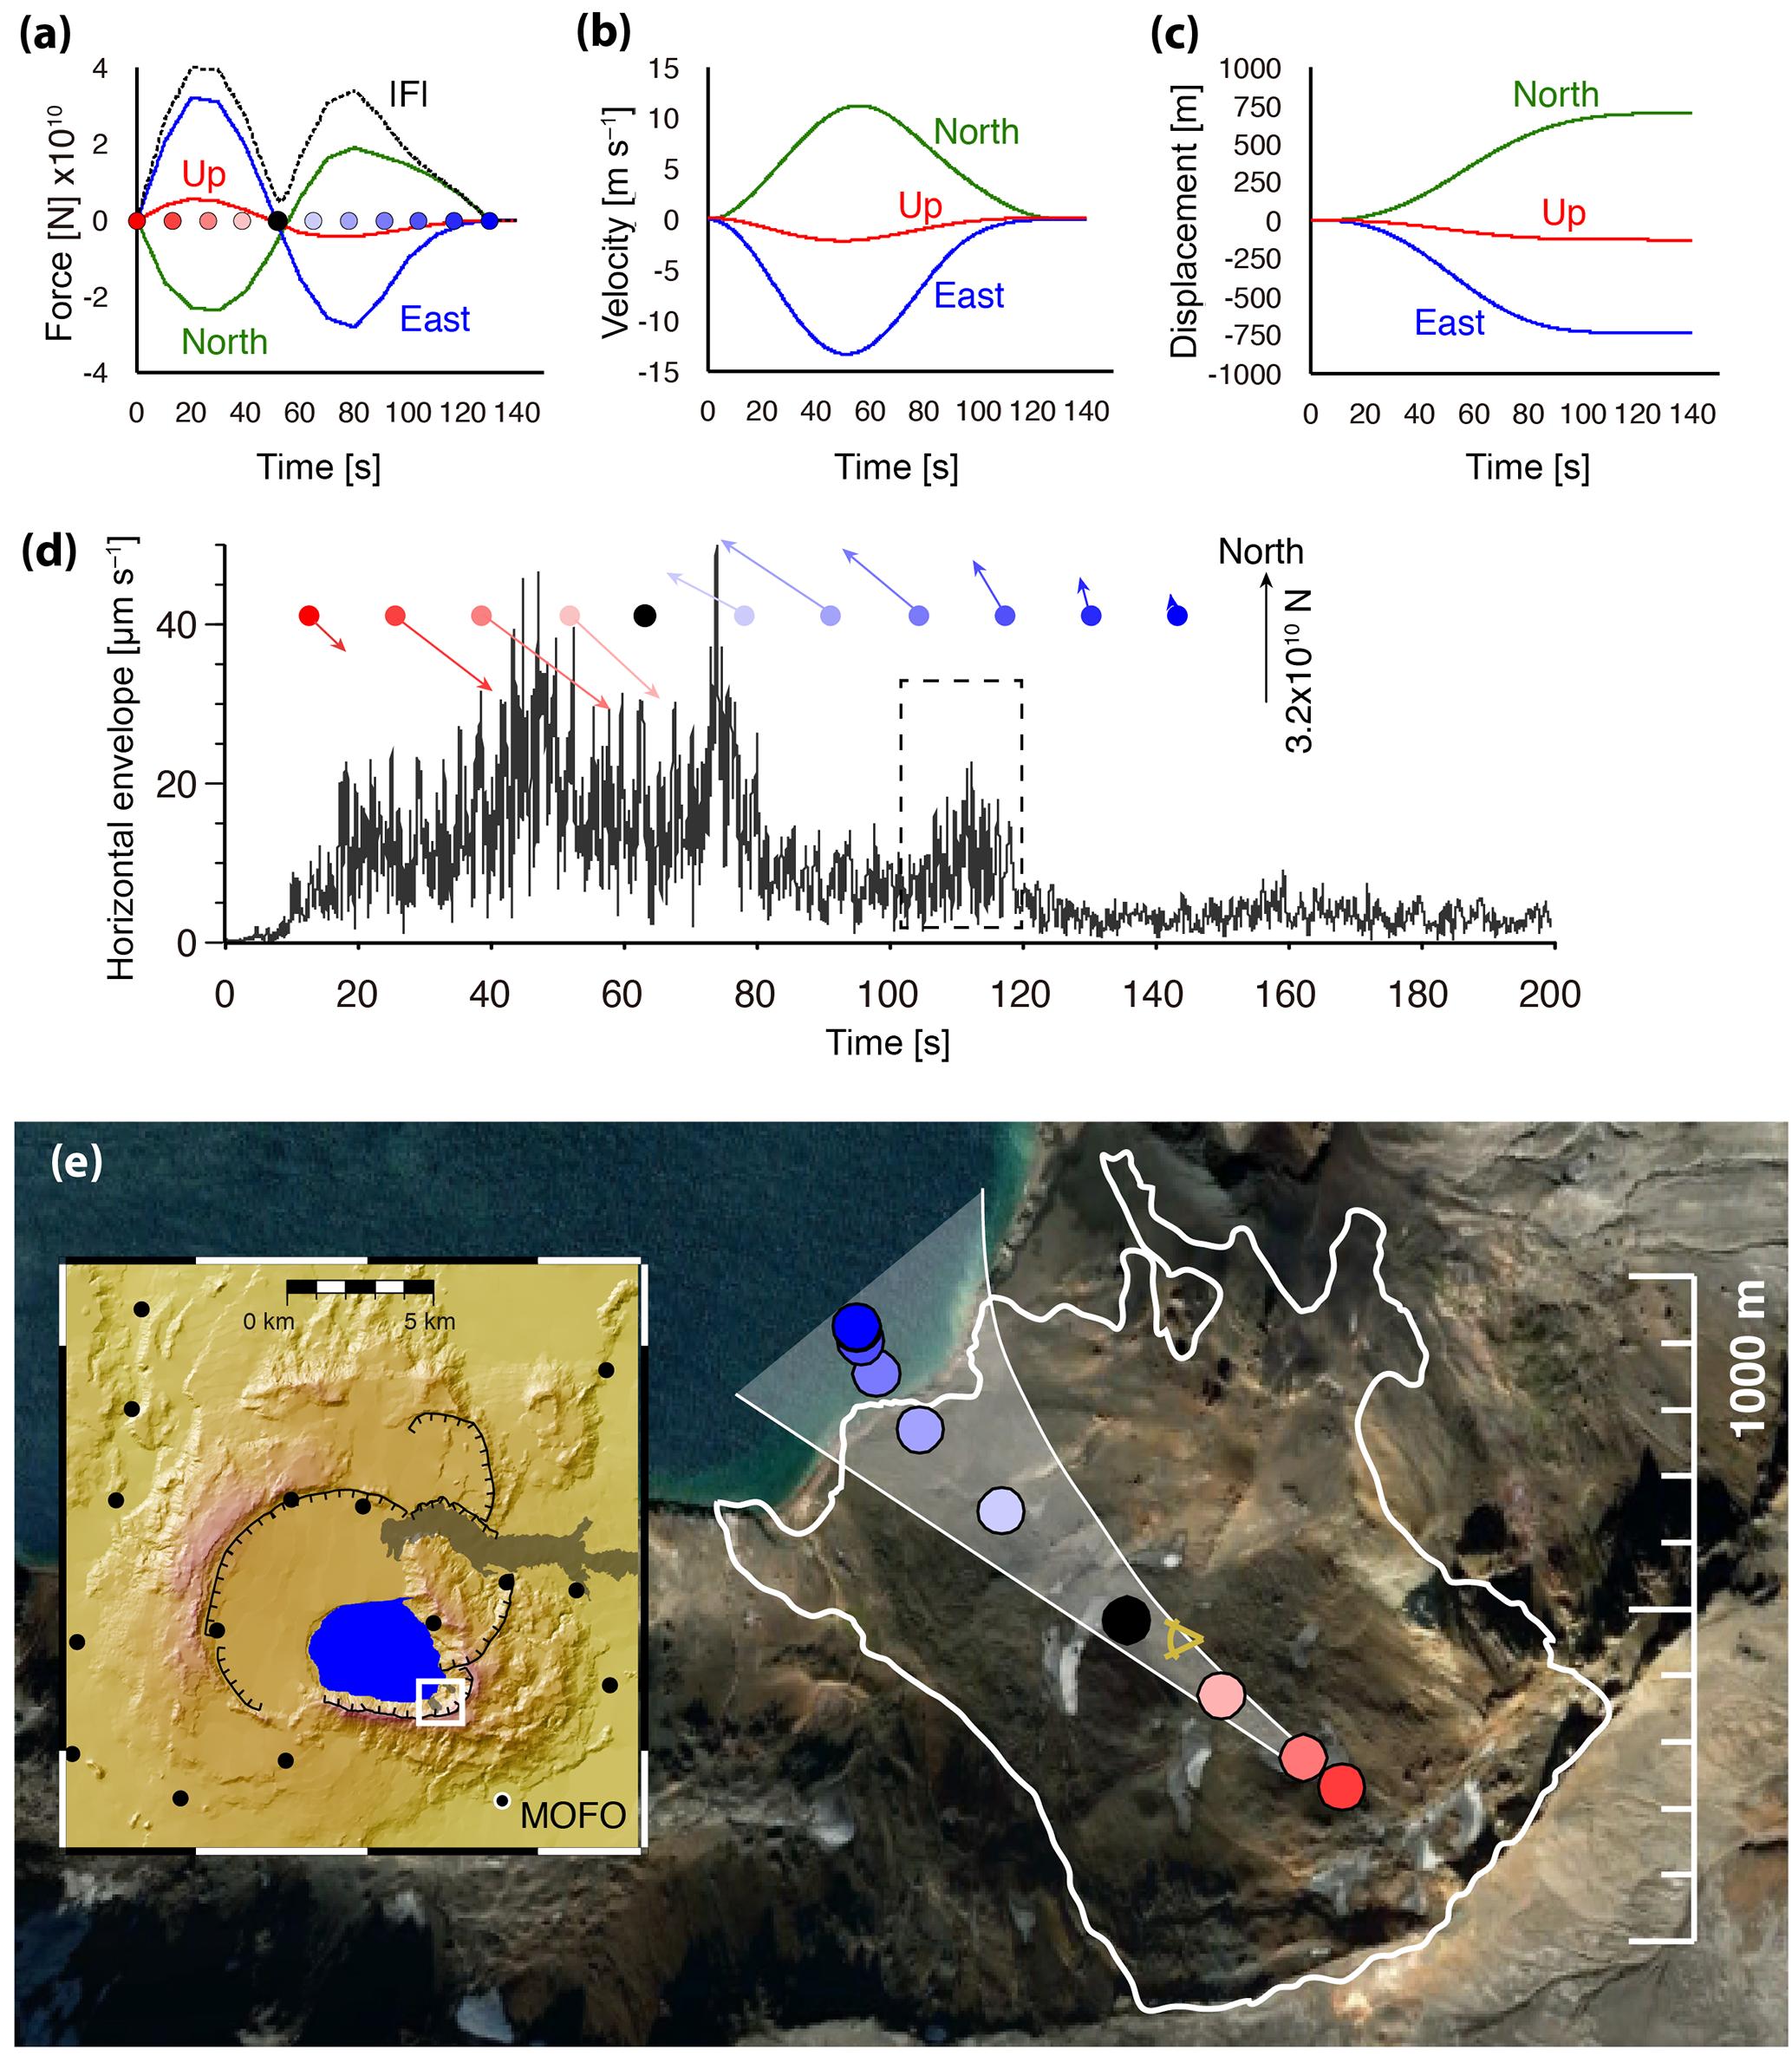 esurf dynamics of the askja caldera july 2014 landslide iceland